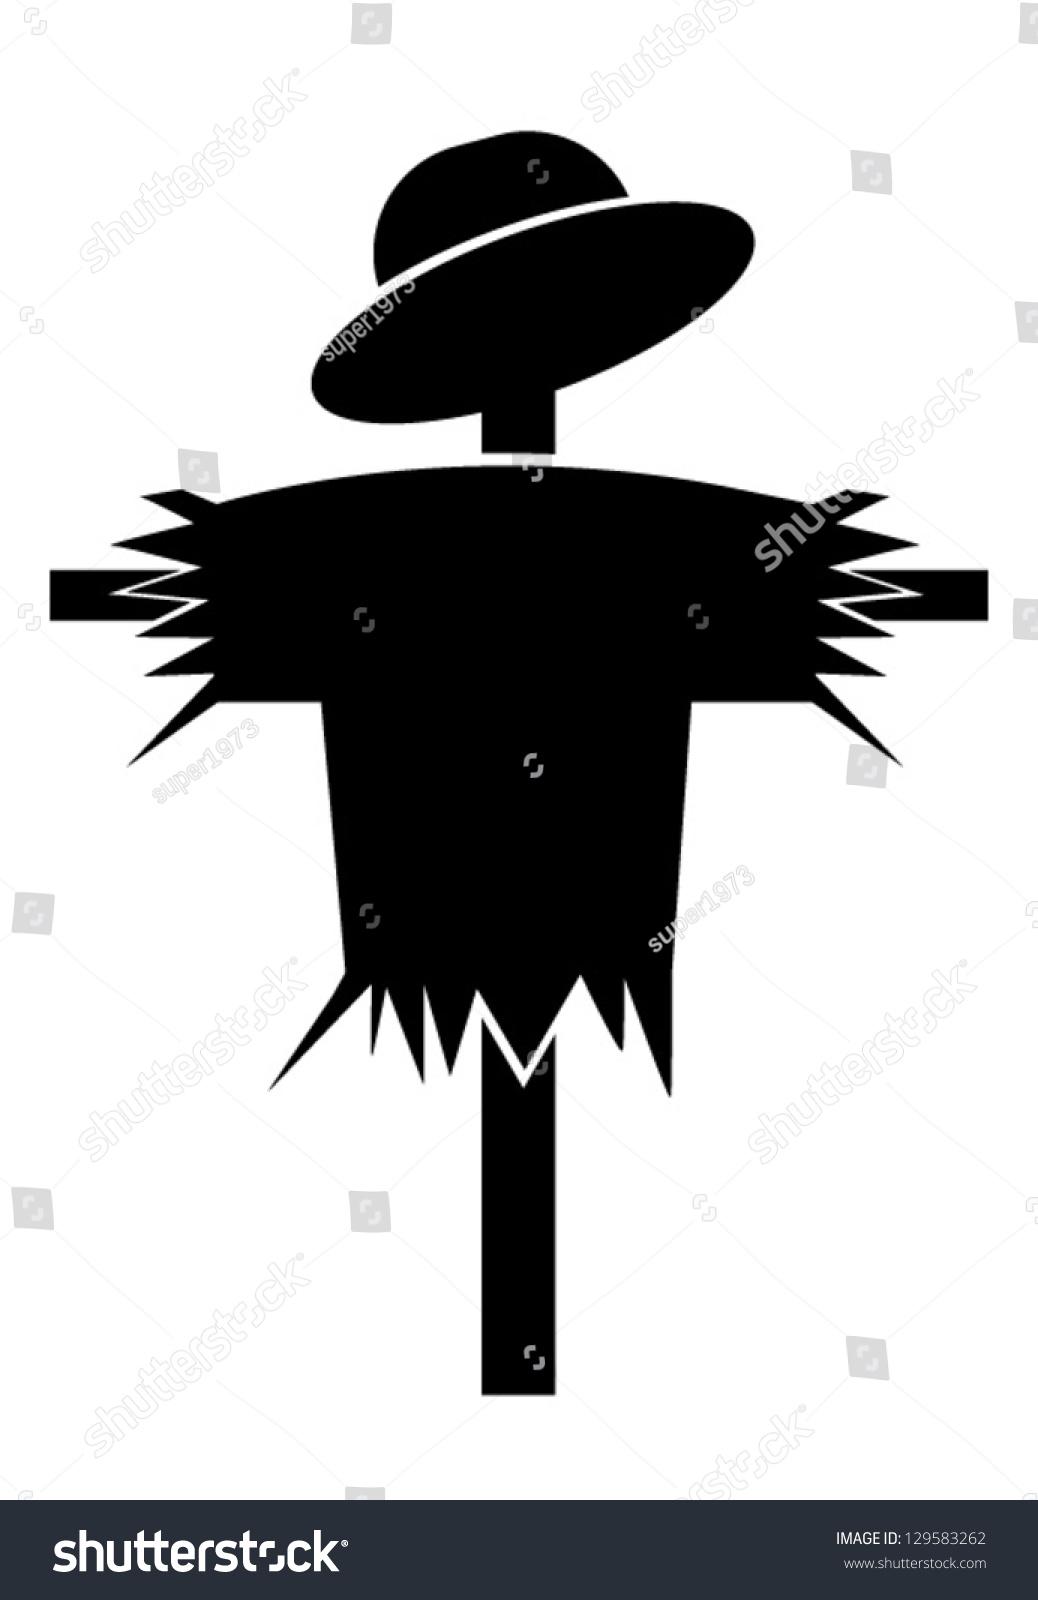 Free vector graphic: Scarecrow, Straw, Halloween, Autumn - Free ...